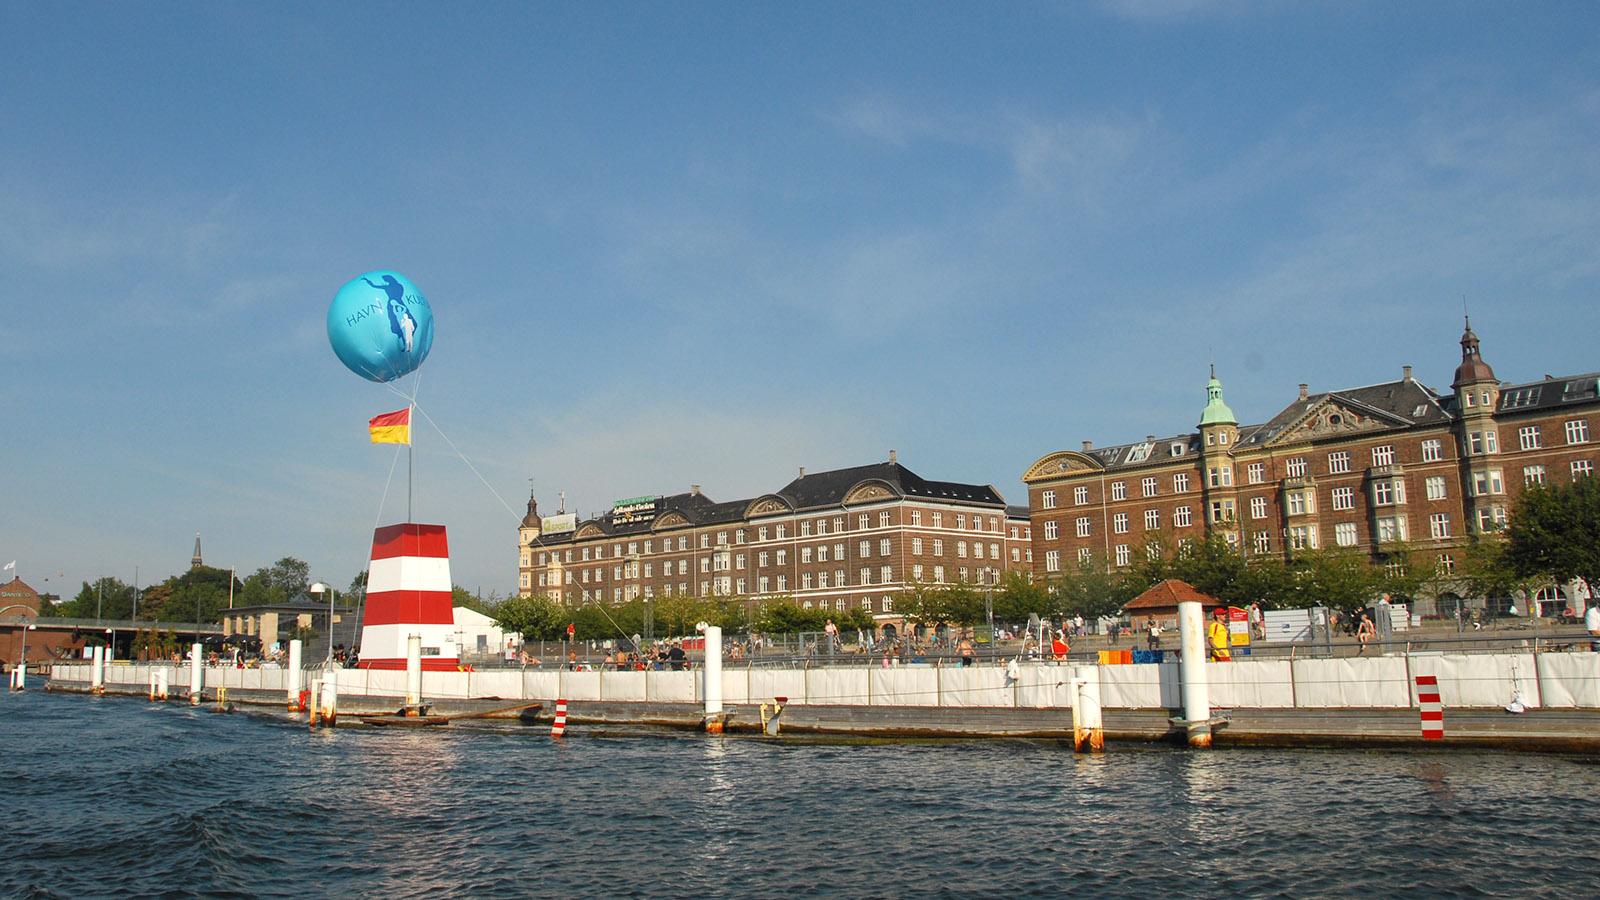 Grünes Kopenhagen. Islands Brygge. Foto: Hilke Maunder